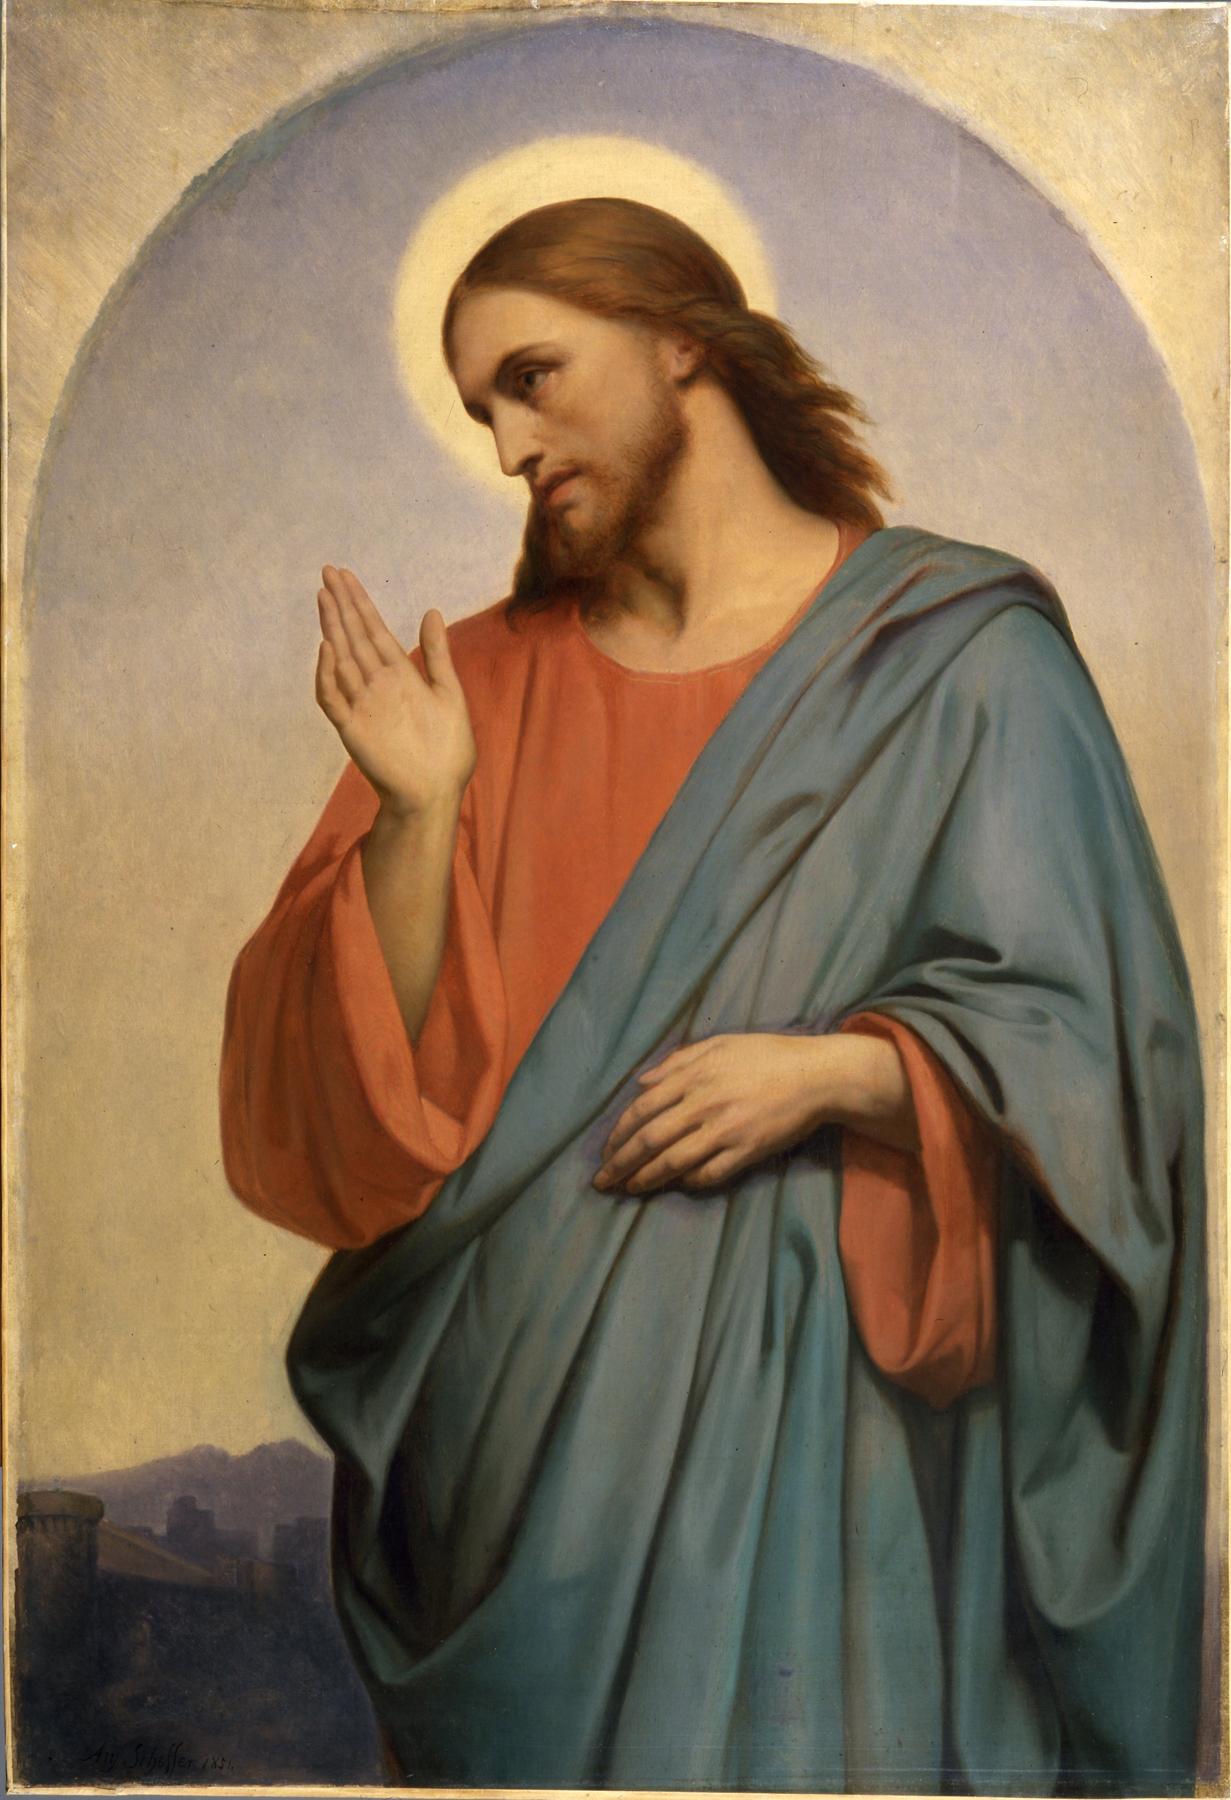 christ-weeping-over-jerusalem-ary-scheffer_1.jpg